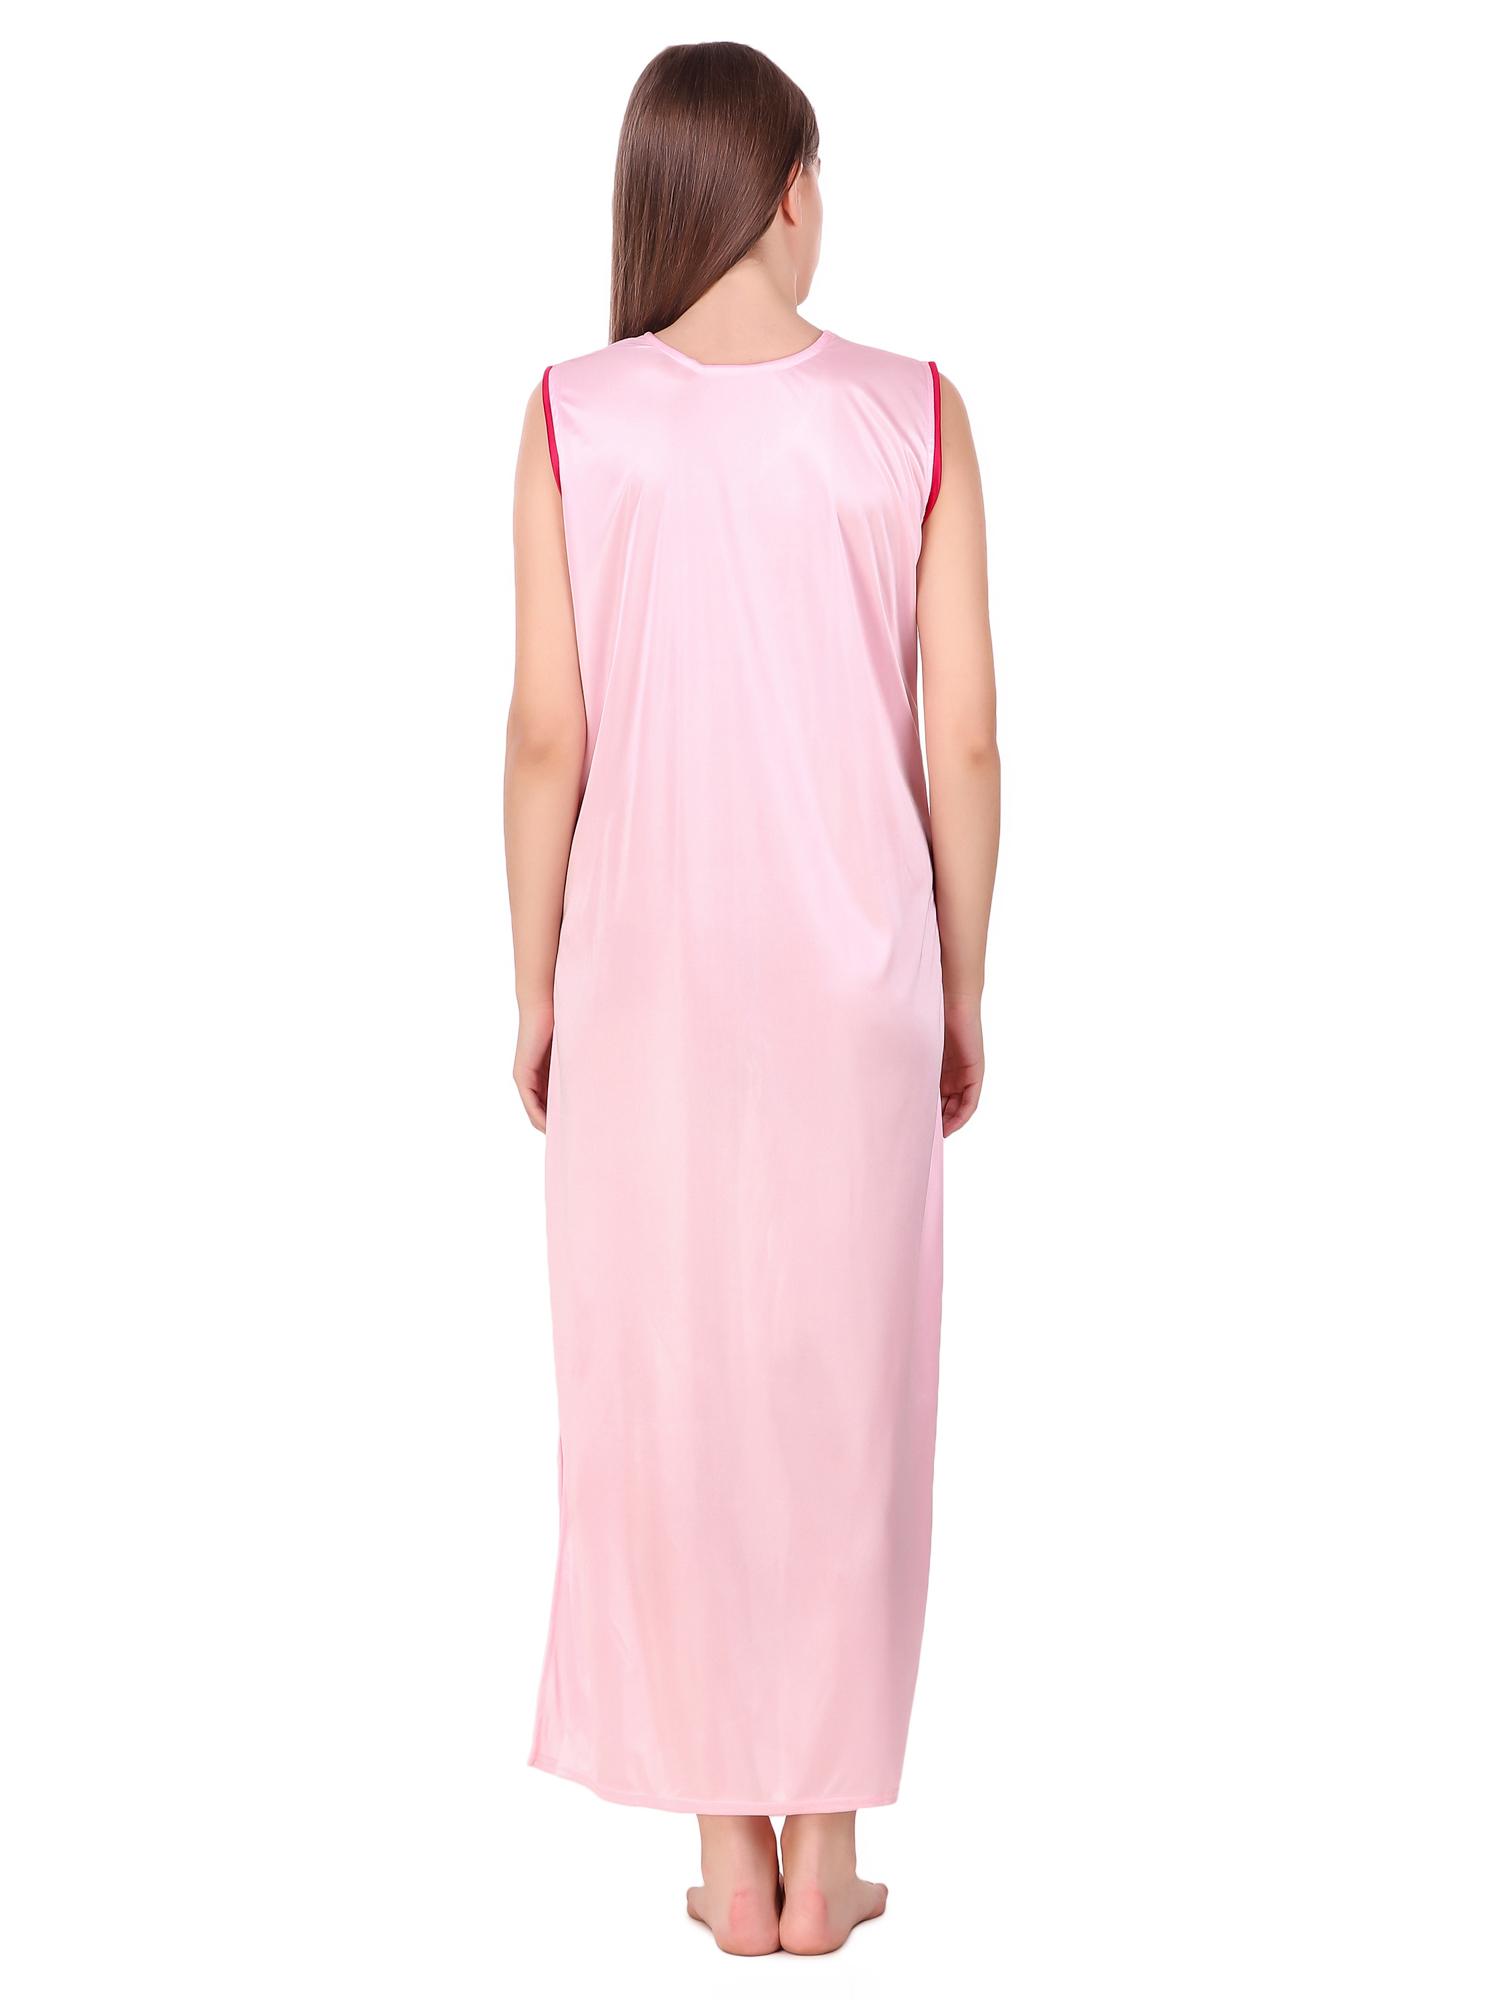 Combo Pack Of 2 Pcs Satin Spandex Nighty Robe Nightwear Set